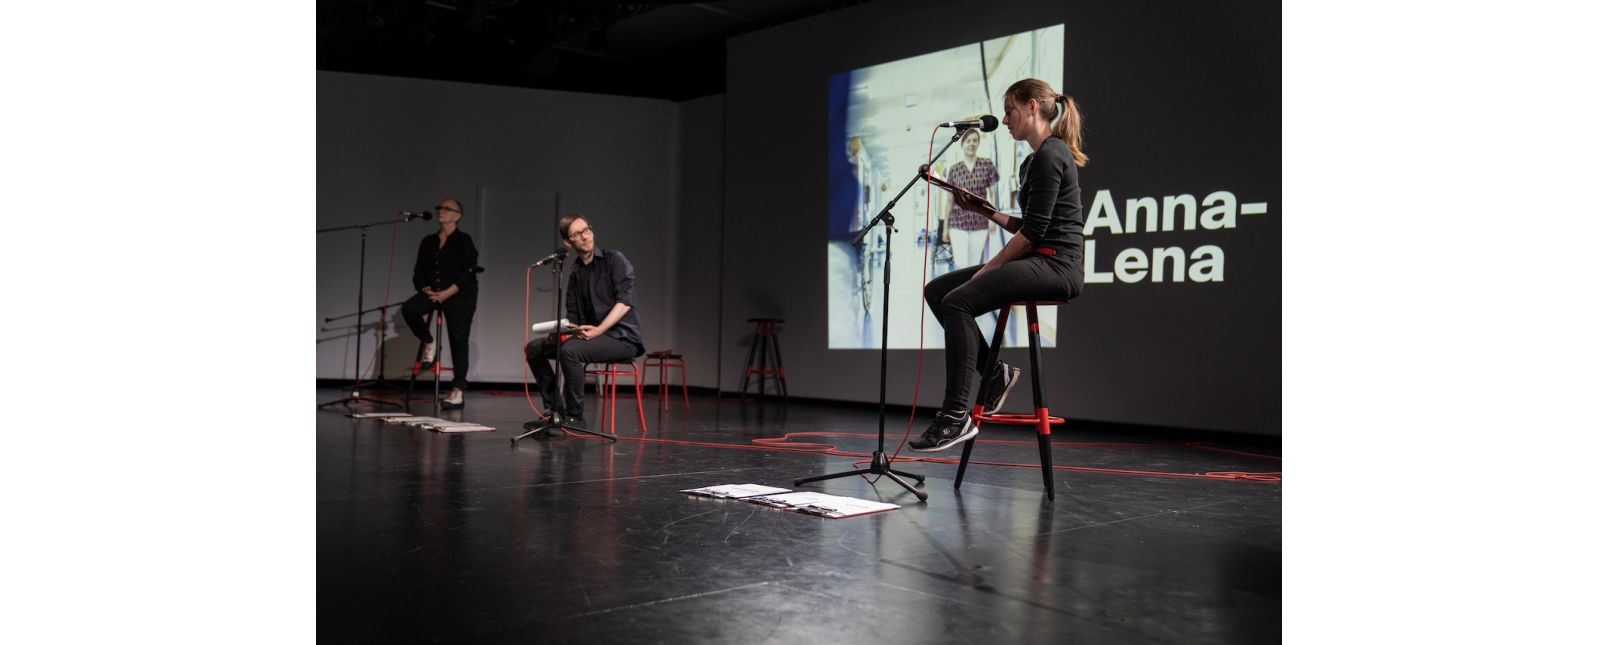 AUF KLINGEL // Margarethe Mehring-Fuchs / Michael Kaiser / Hannah Ganter // 2021 // Foto: Britt Schilling